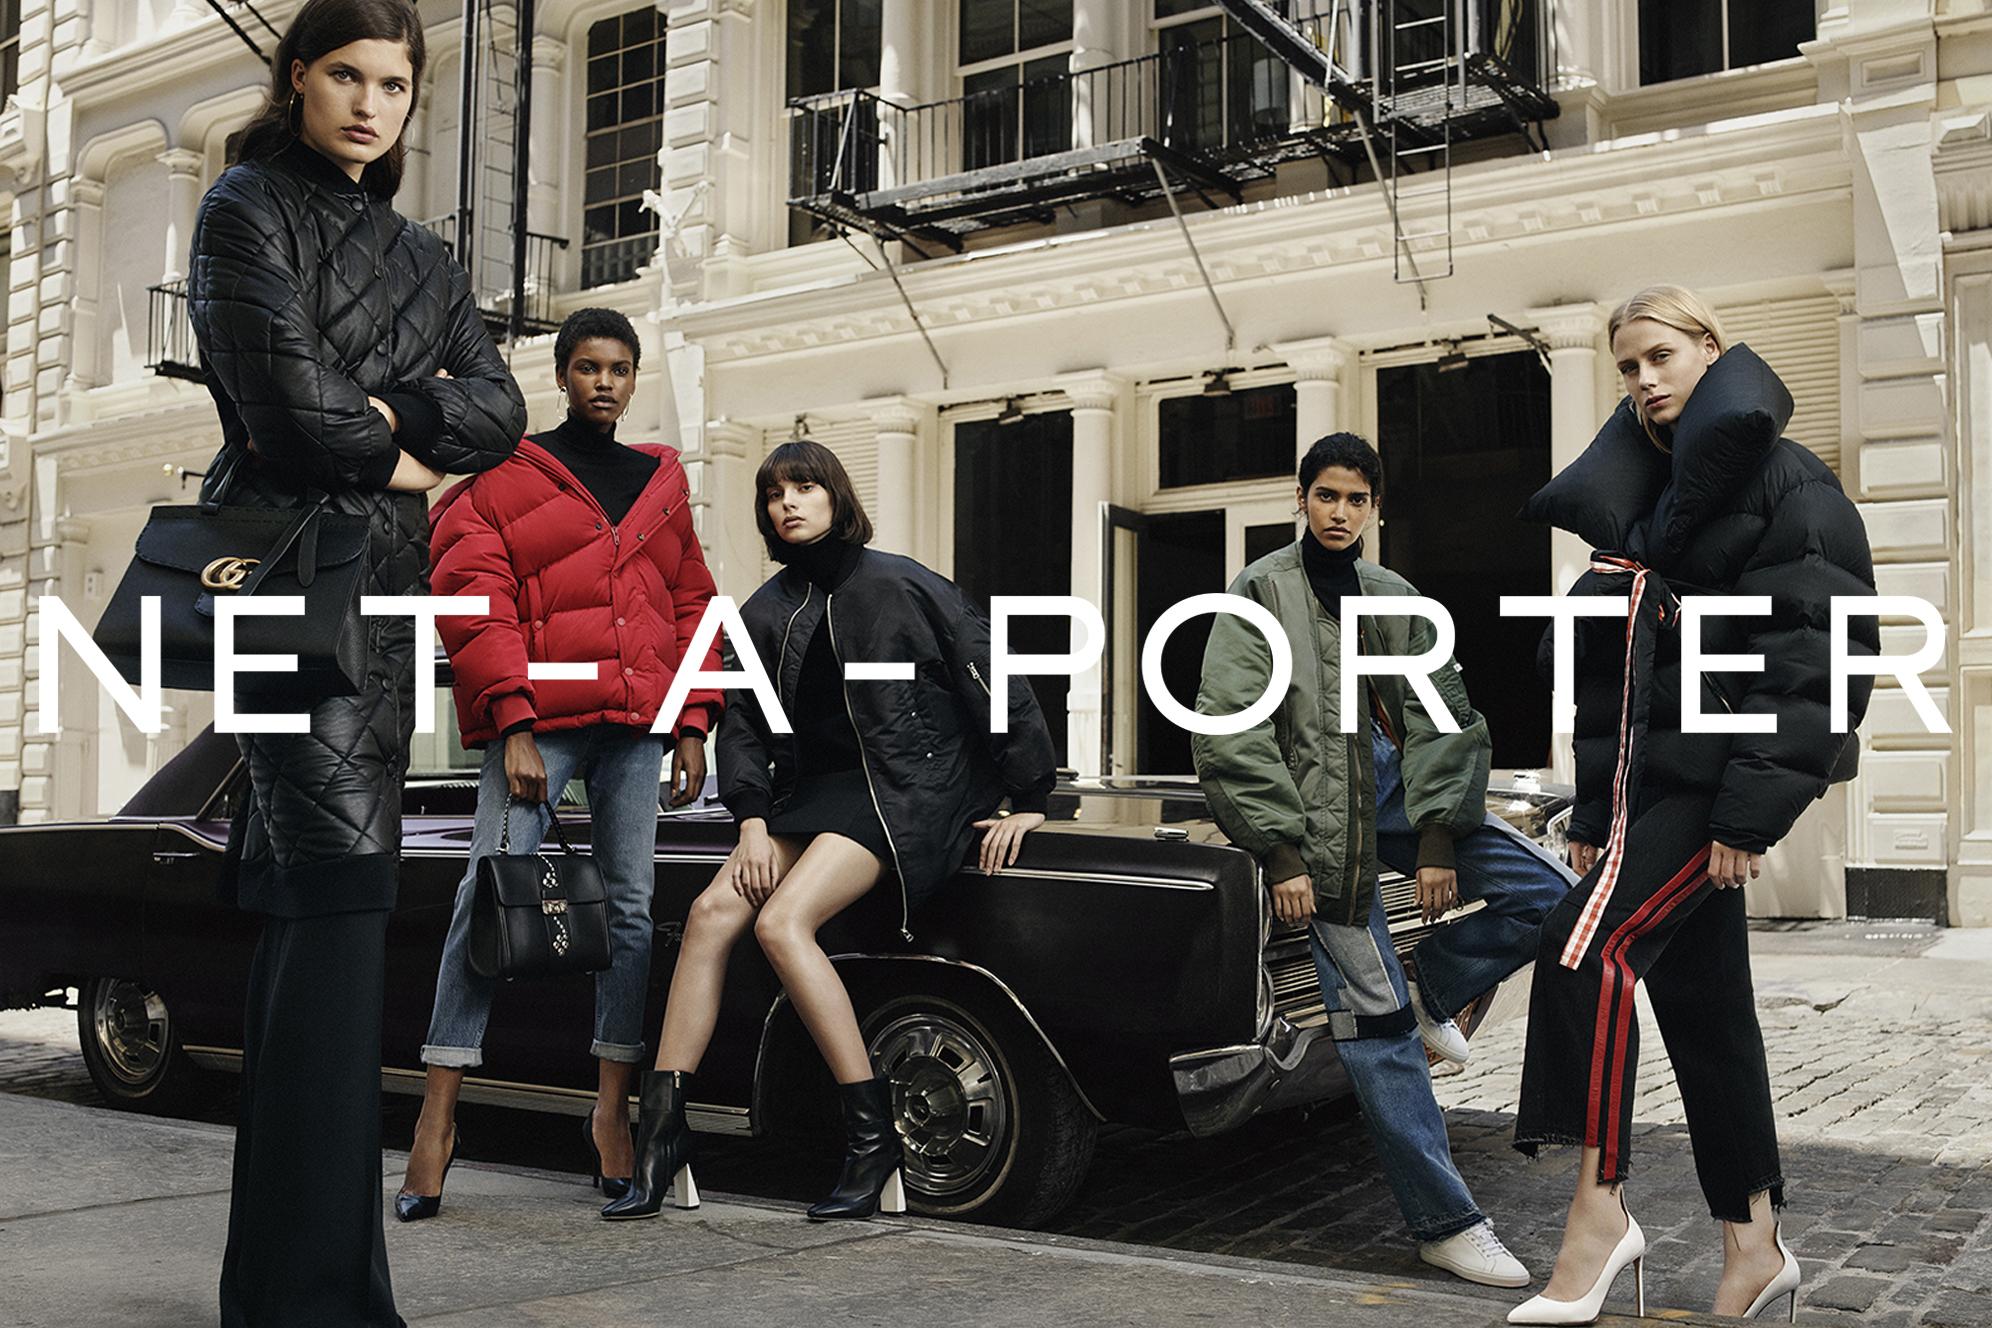 Net-a-porter's sporty jacket fall campaign.